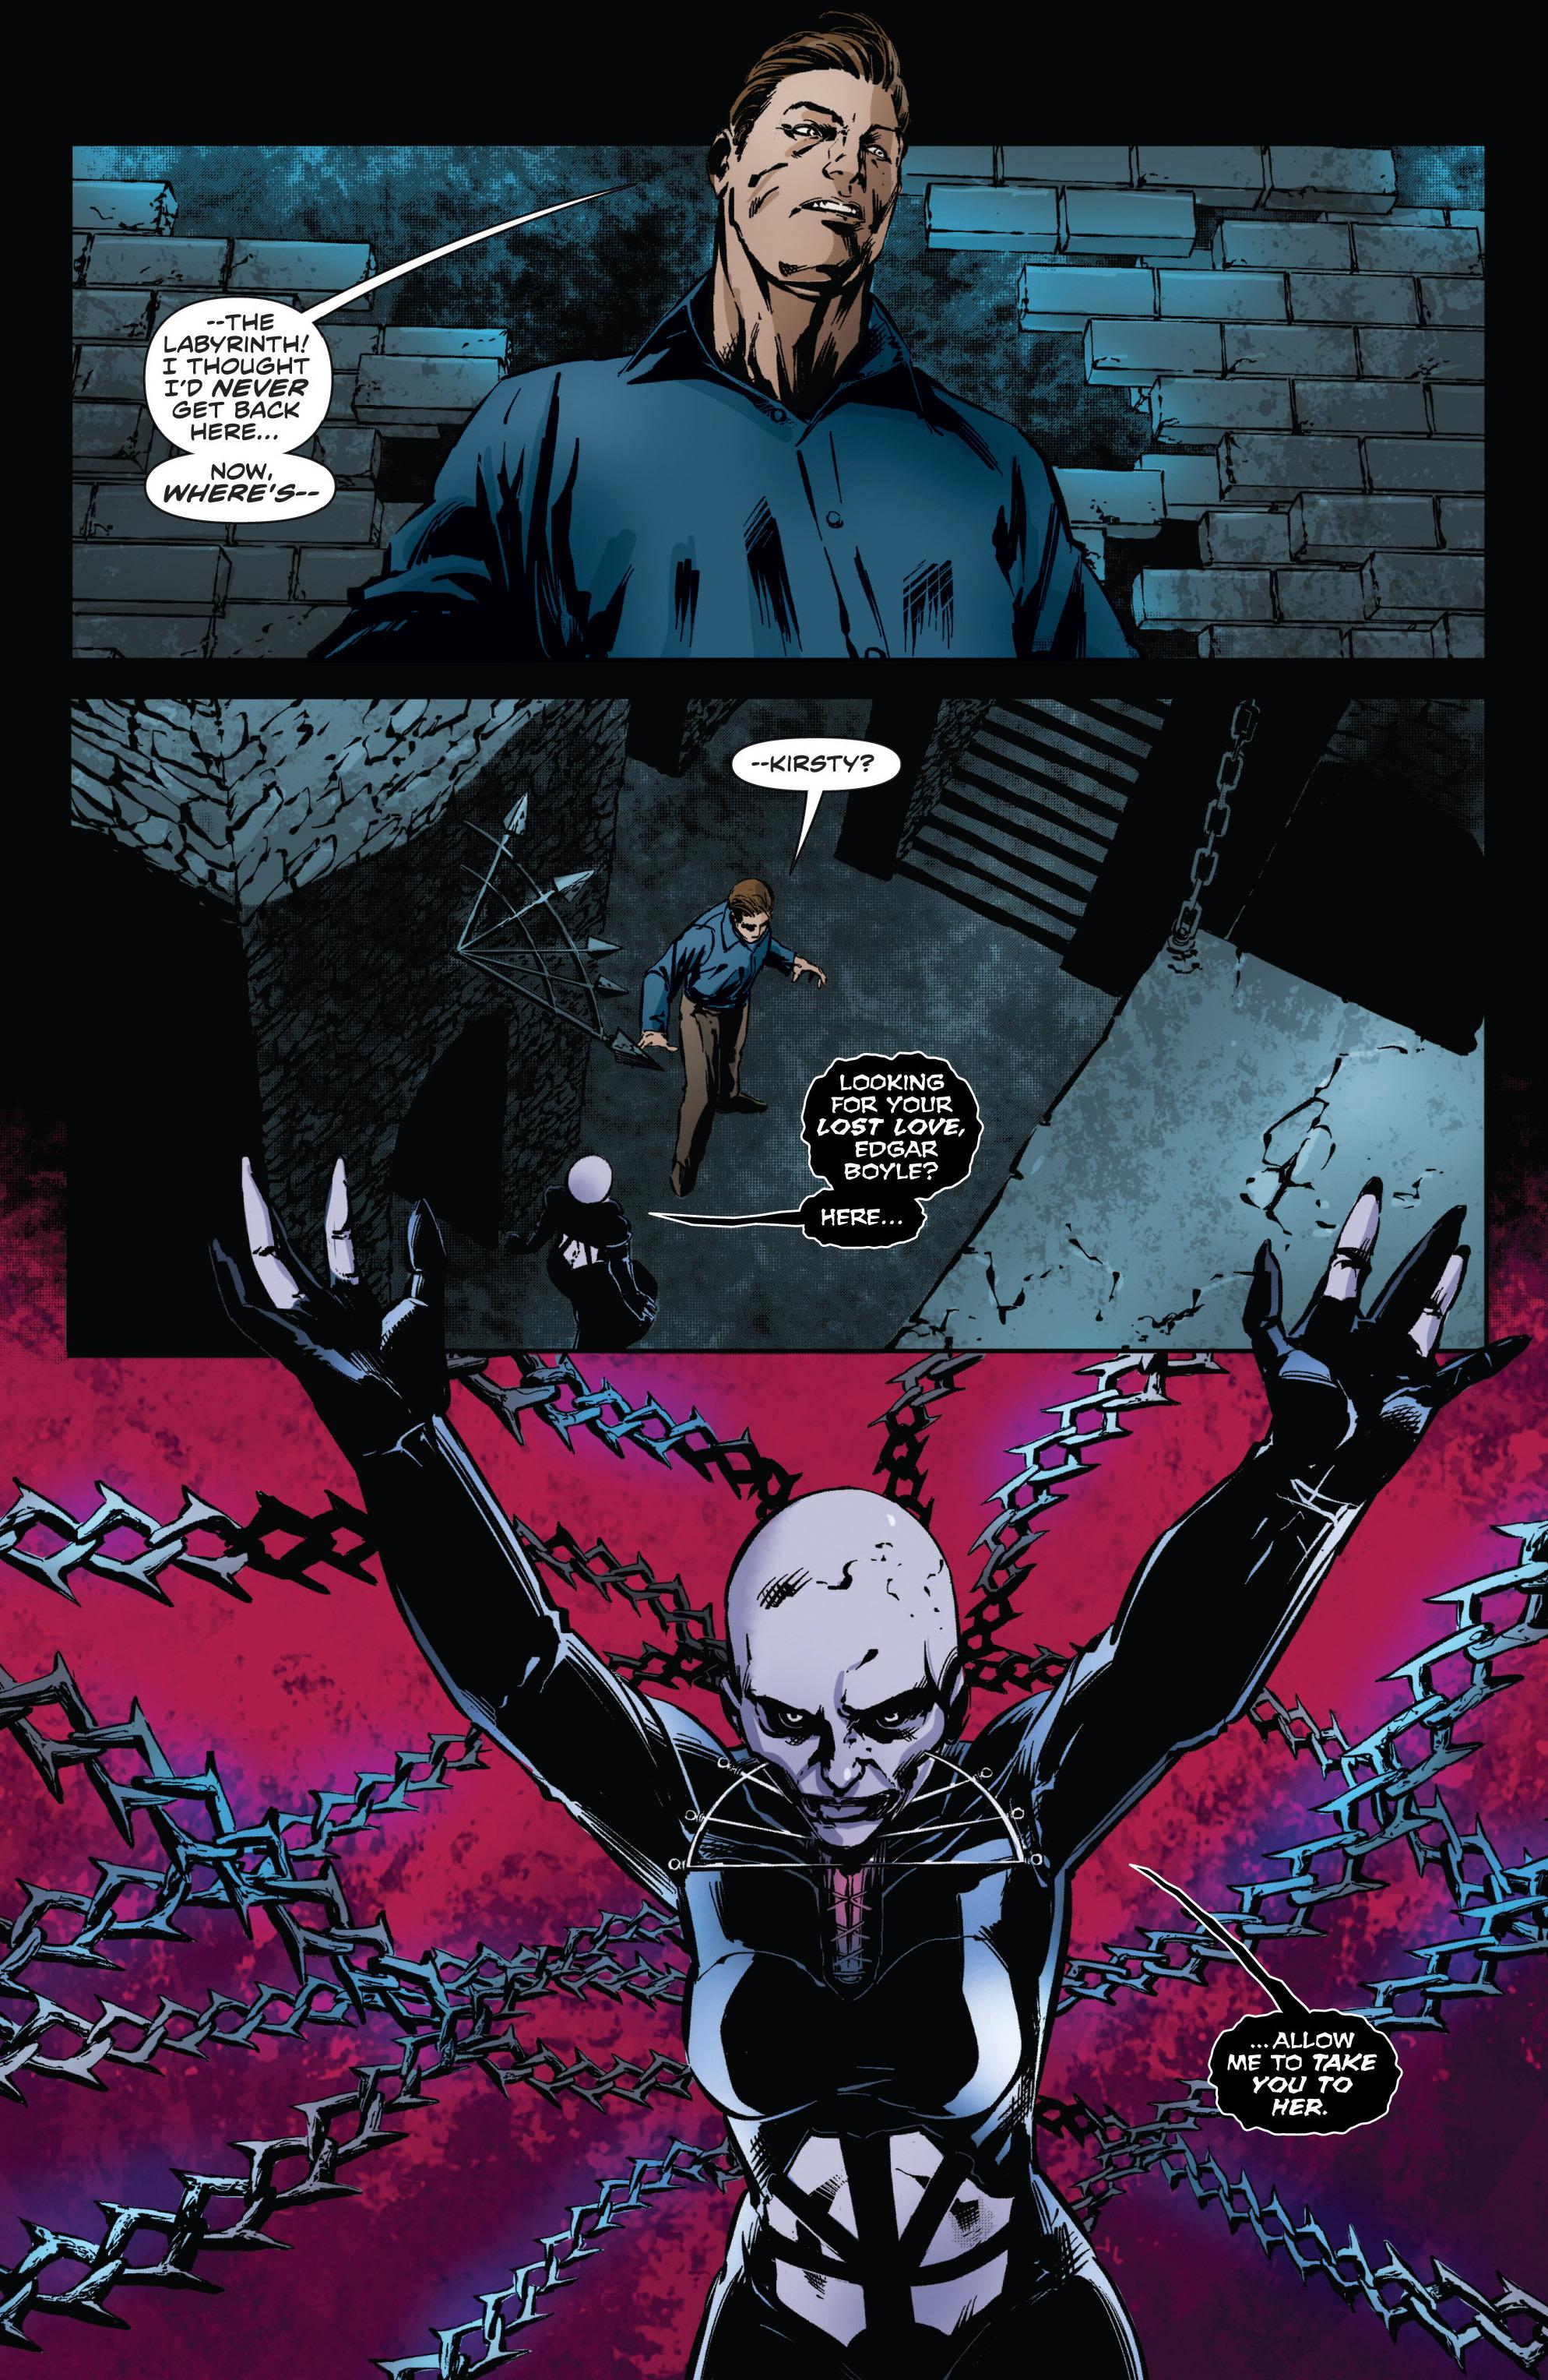 Read online Clive Barker's Hellraiser: The Dark Watch comic -  Issue # TPB 3 - 66